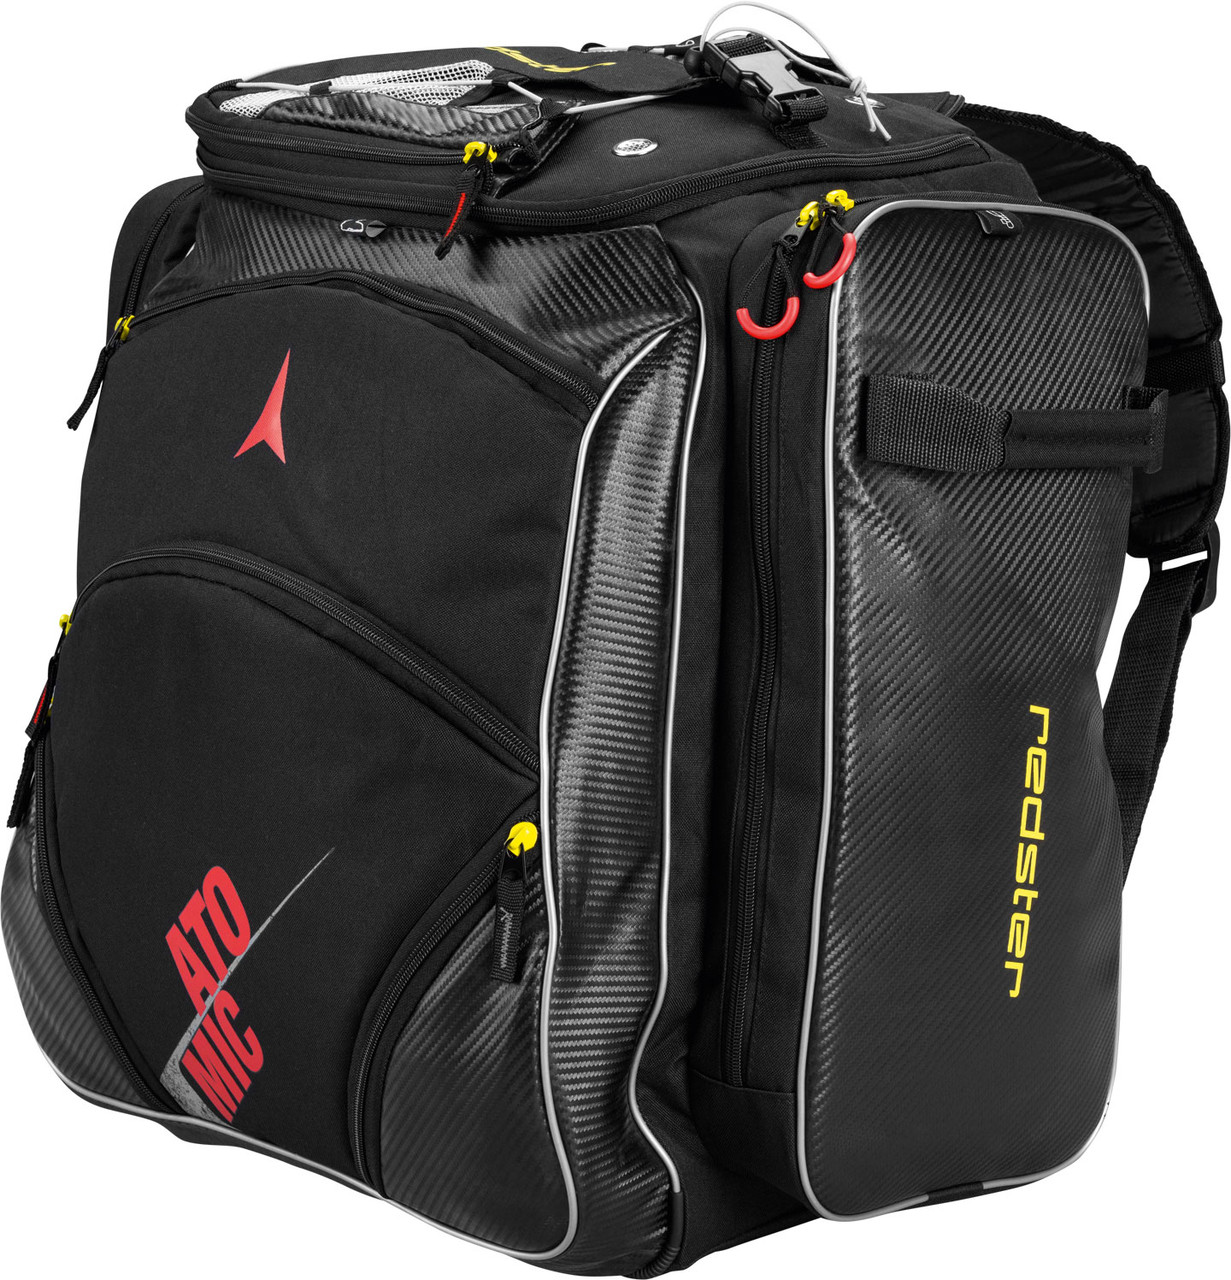 Сумка для ботинок Atomic REDSTER HEATED BOOT BAG (65L) black (MD)